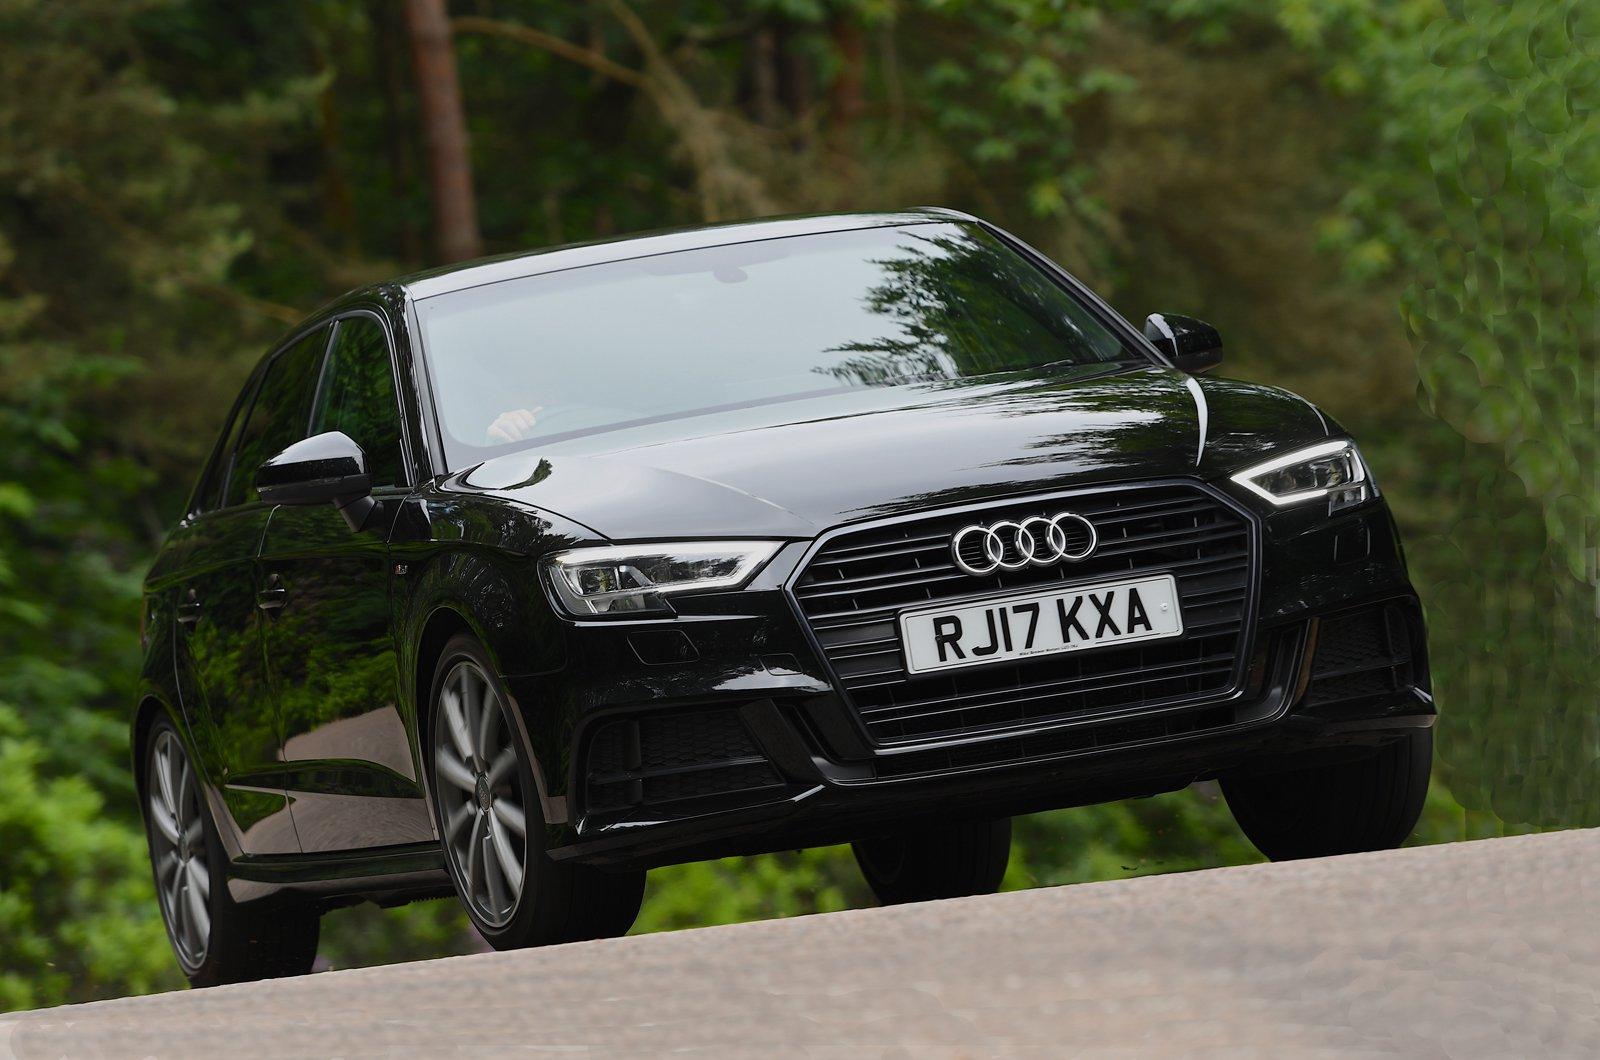 Audi A3 Sportback front - black